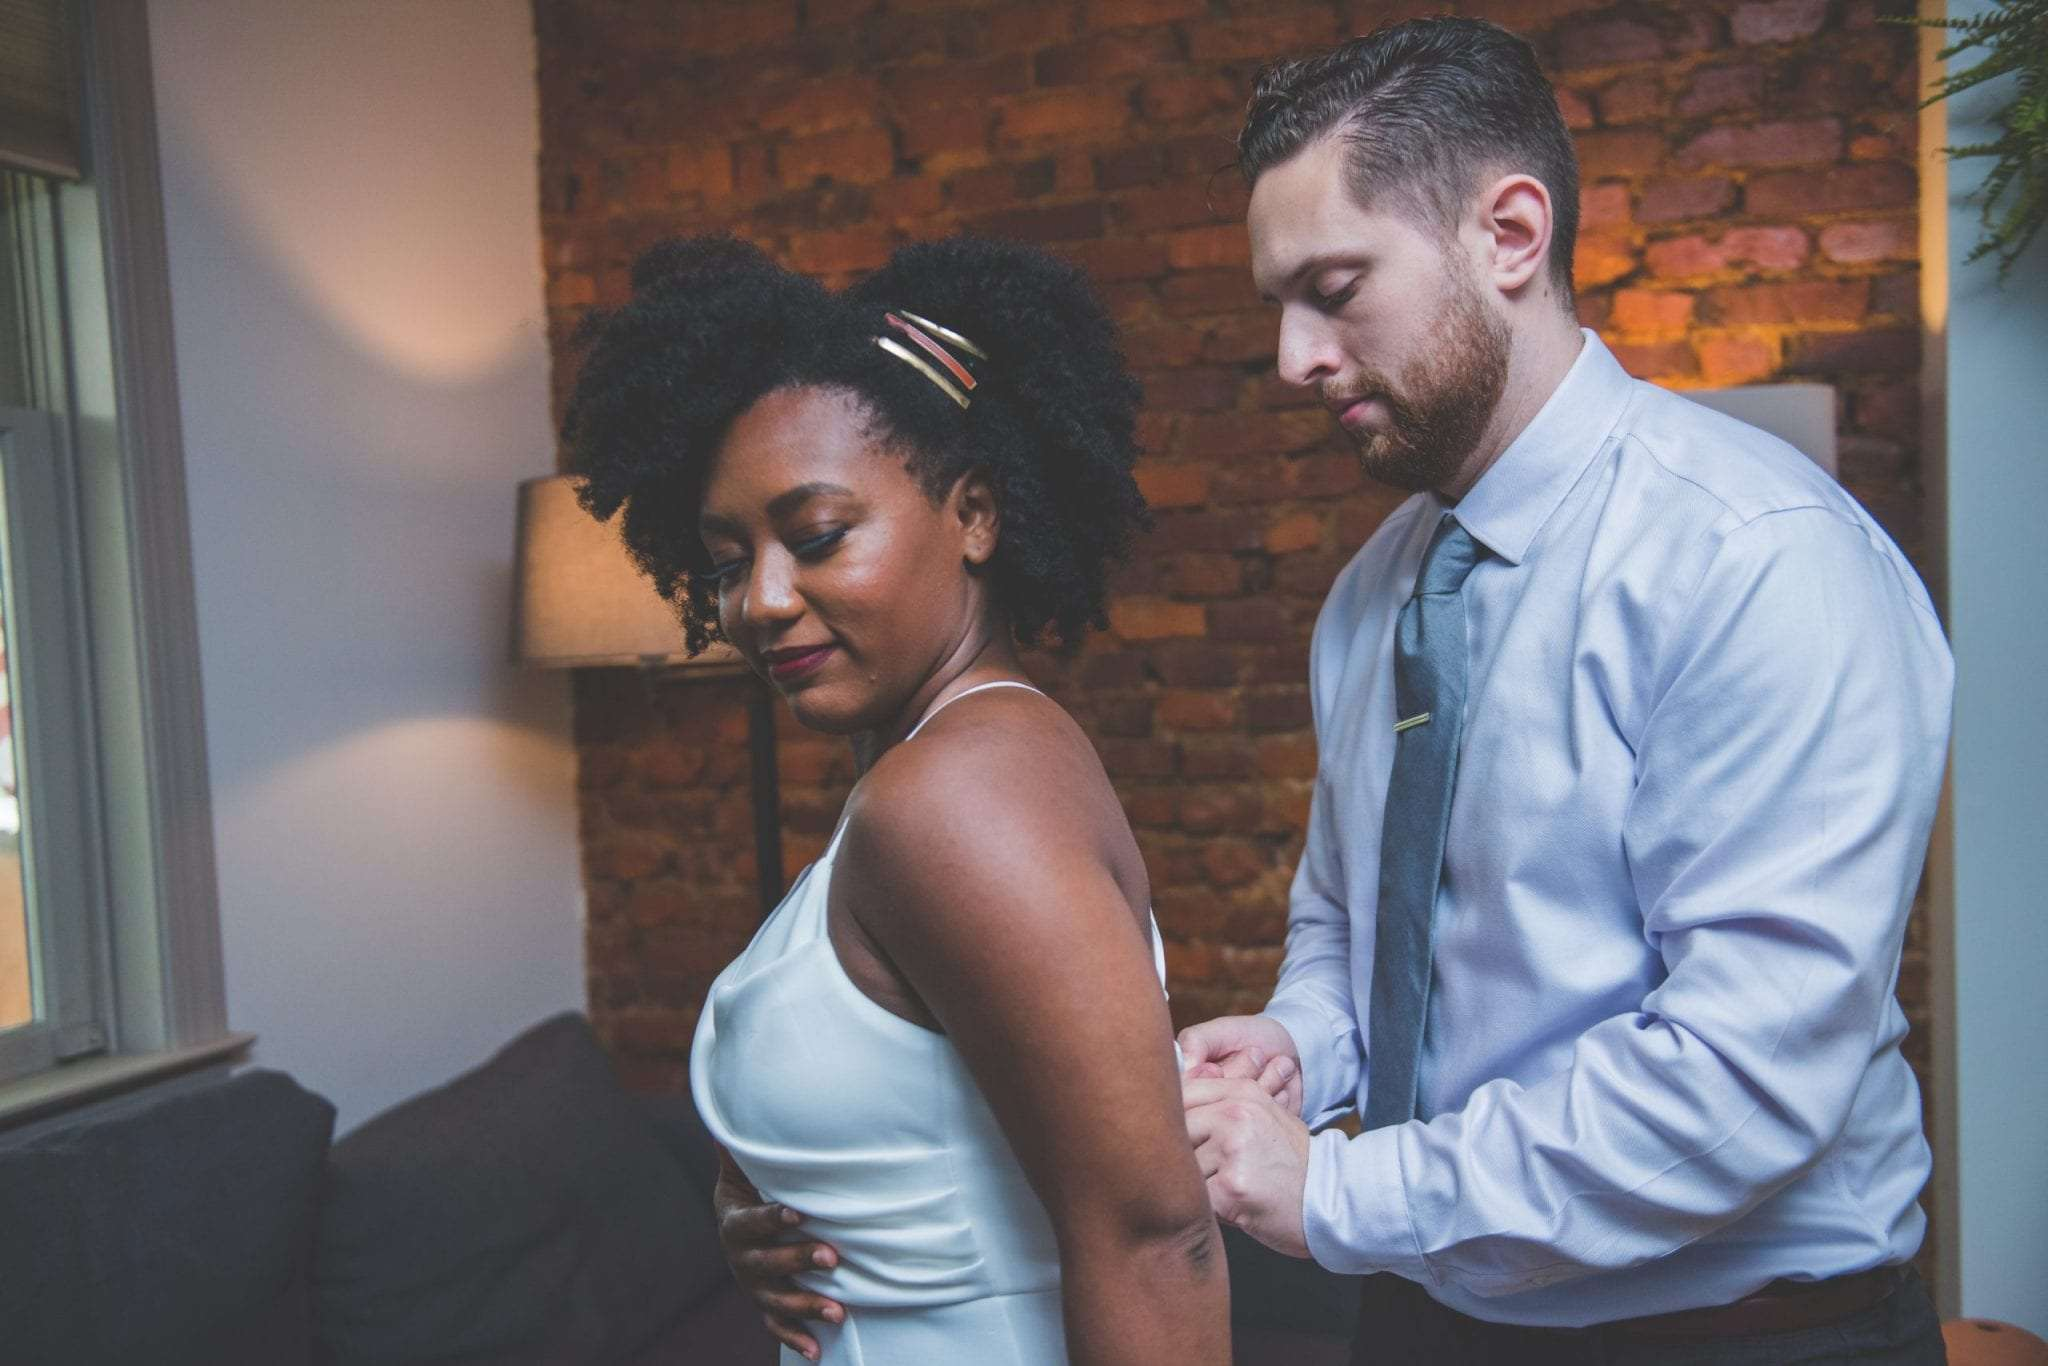 Groom helping bride get ready NJ wedding photographer